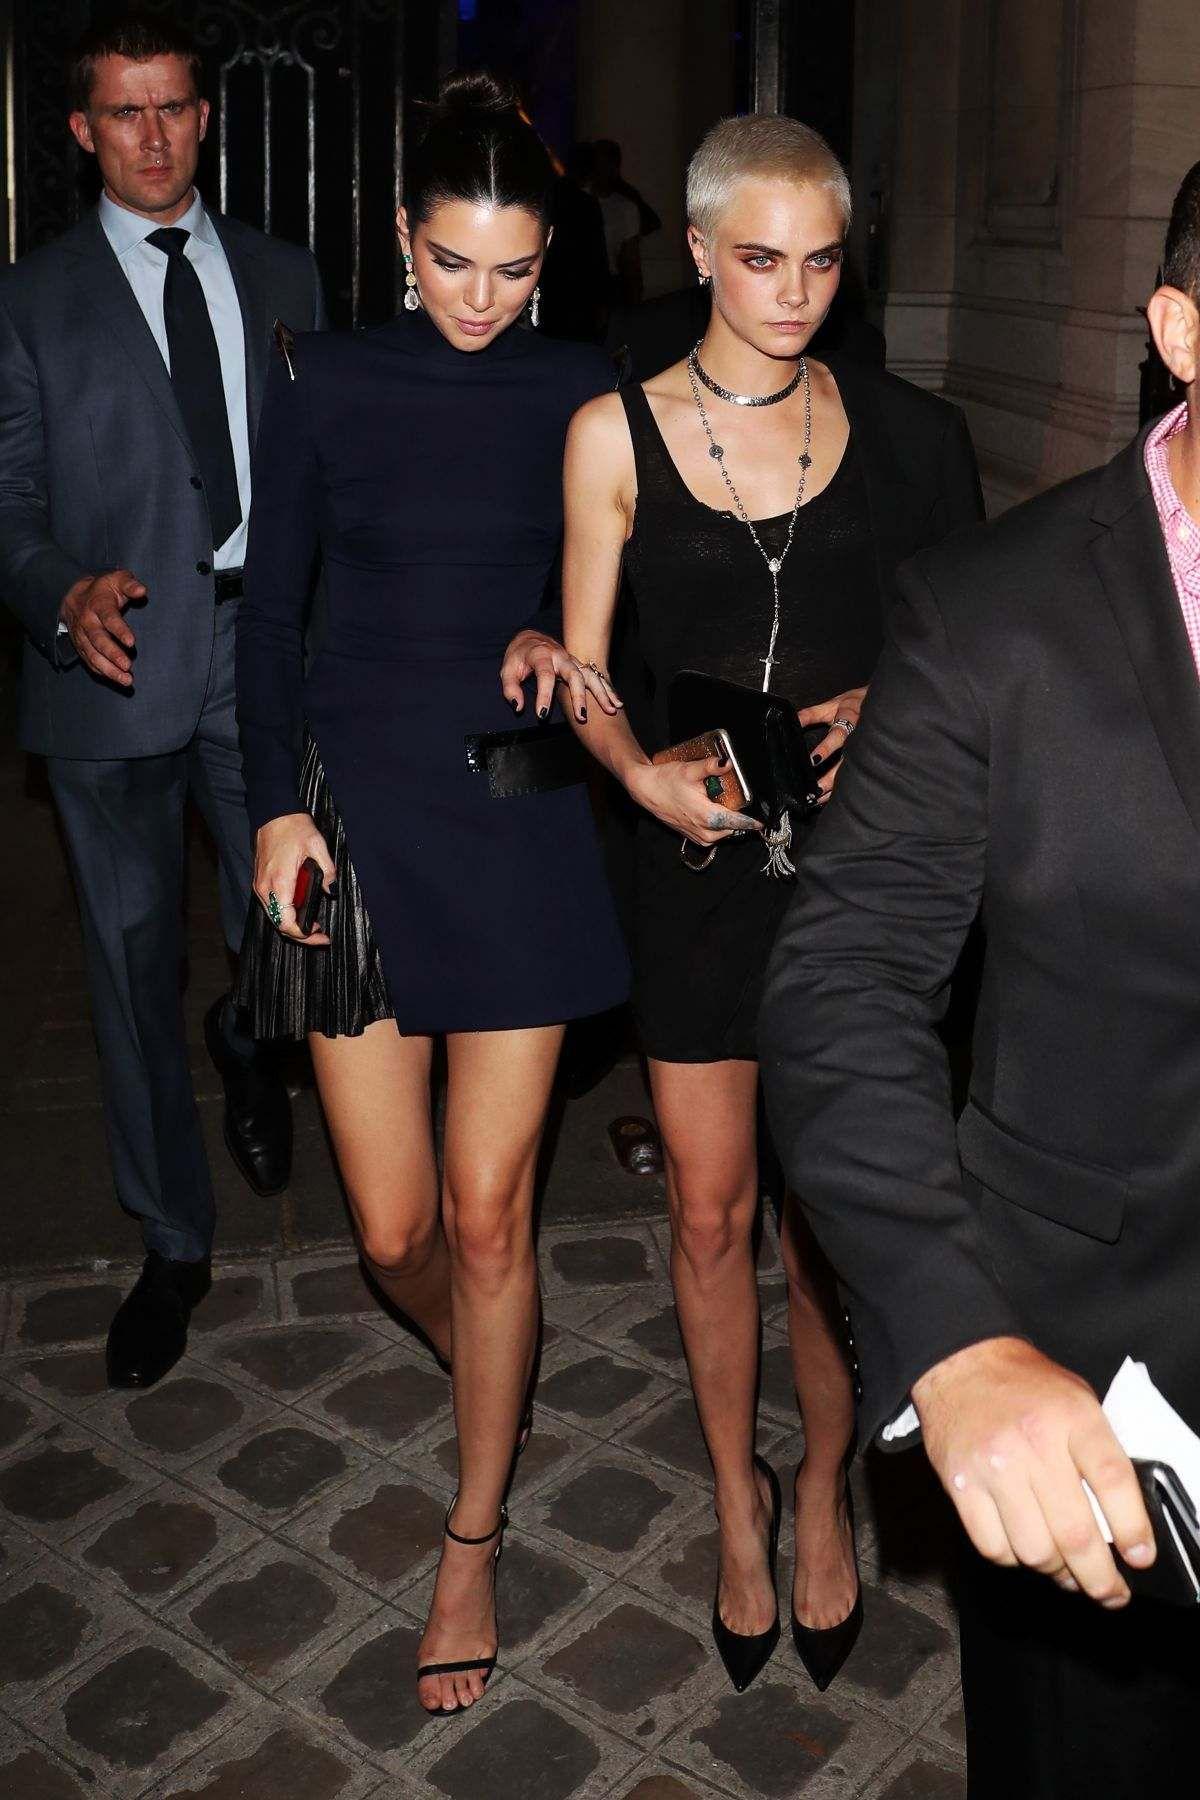 Cara Delevingne And Kendall Jenner At Vogue Party At Paris Fashion Week